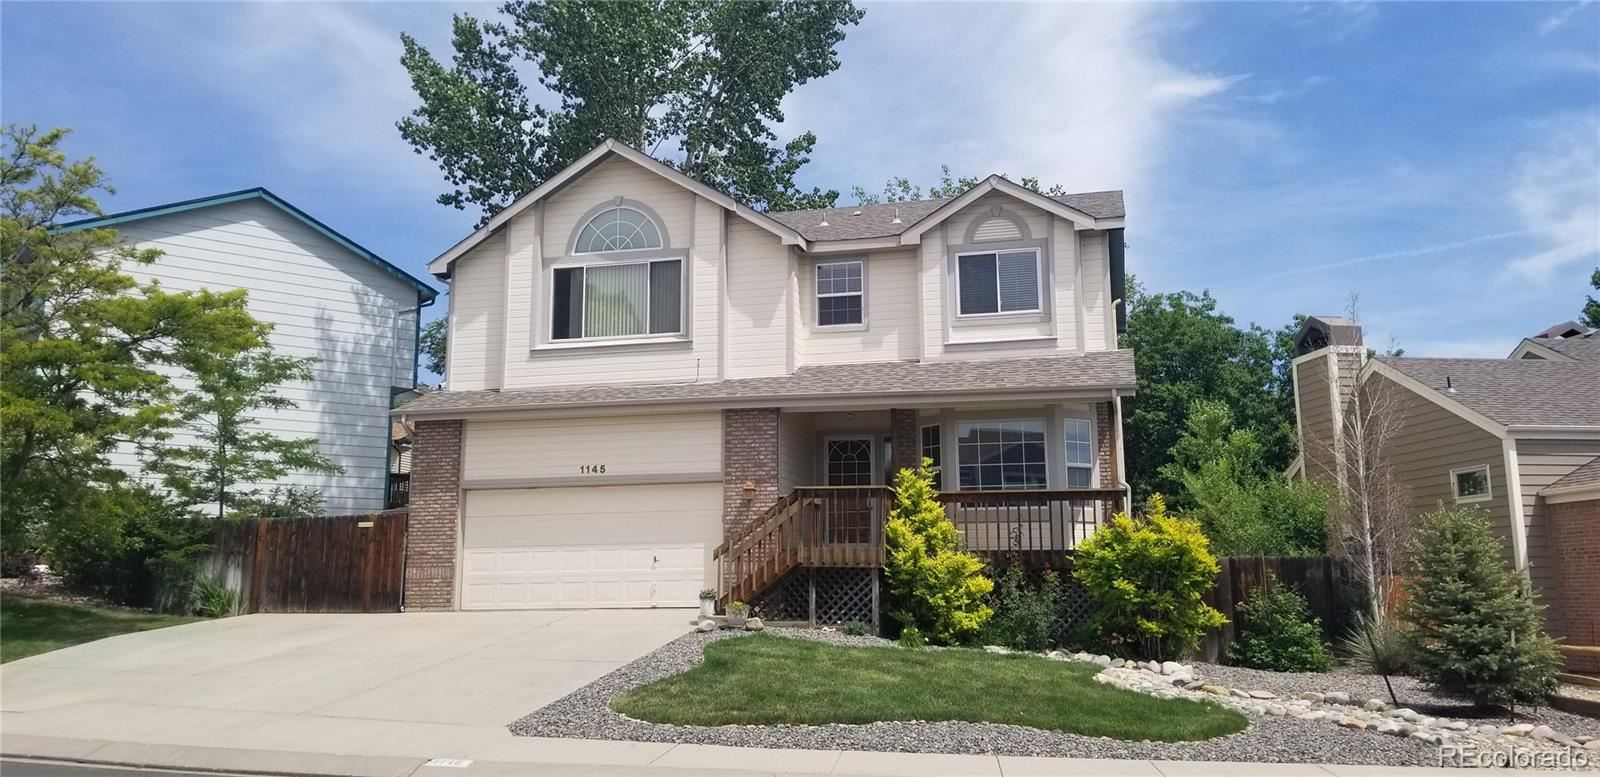 1145 Marlstone Place, Colorado Springs, CO 80904 - #: 2932639